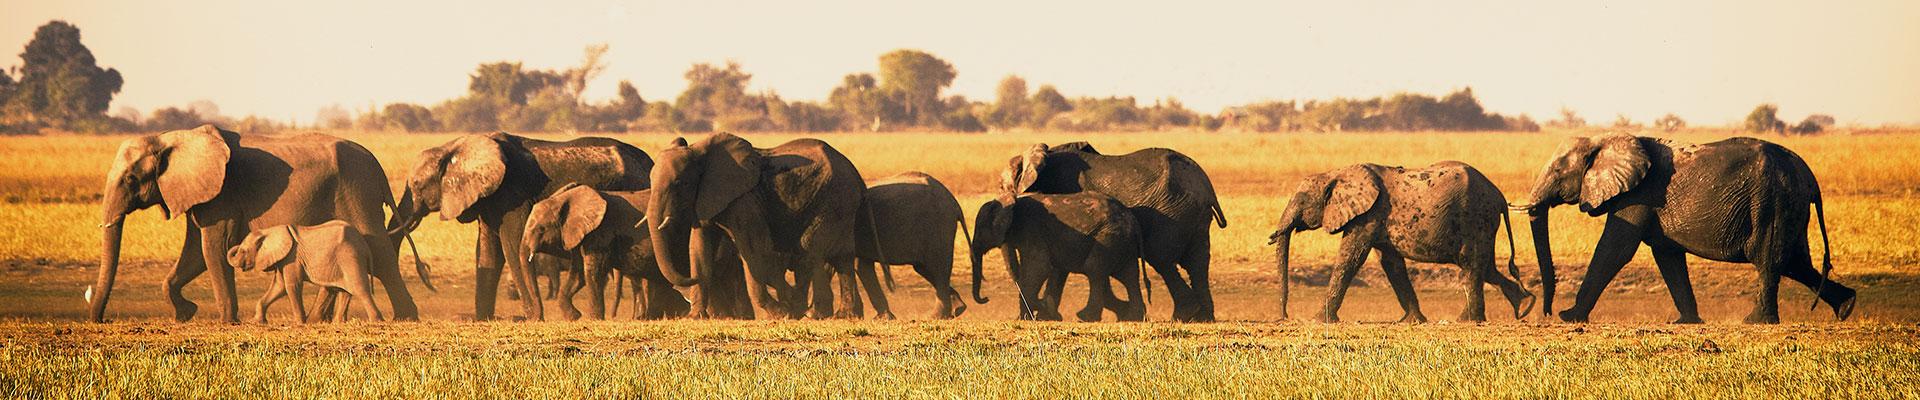 Fantasy RV Tours: 33 Day South Africa RV Safari (33OSAP-021422)